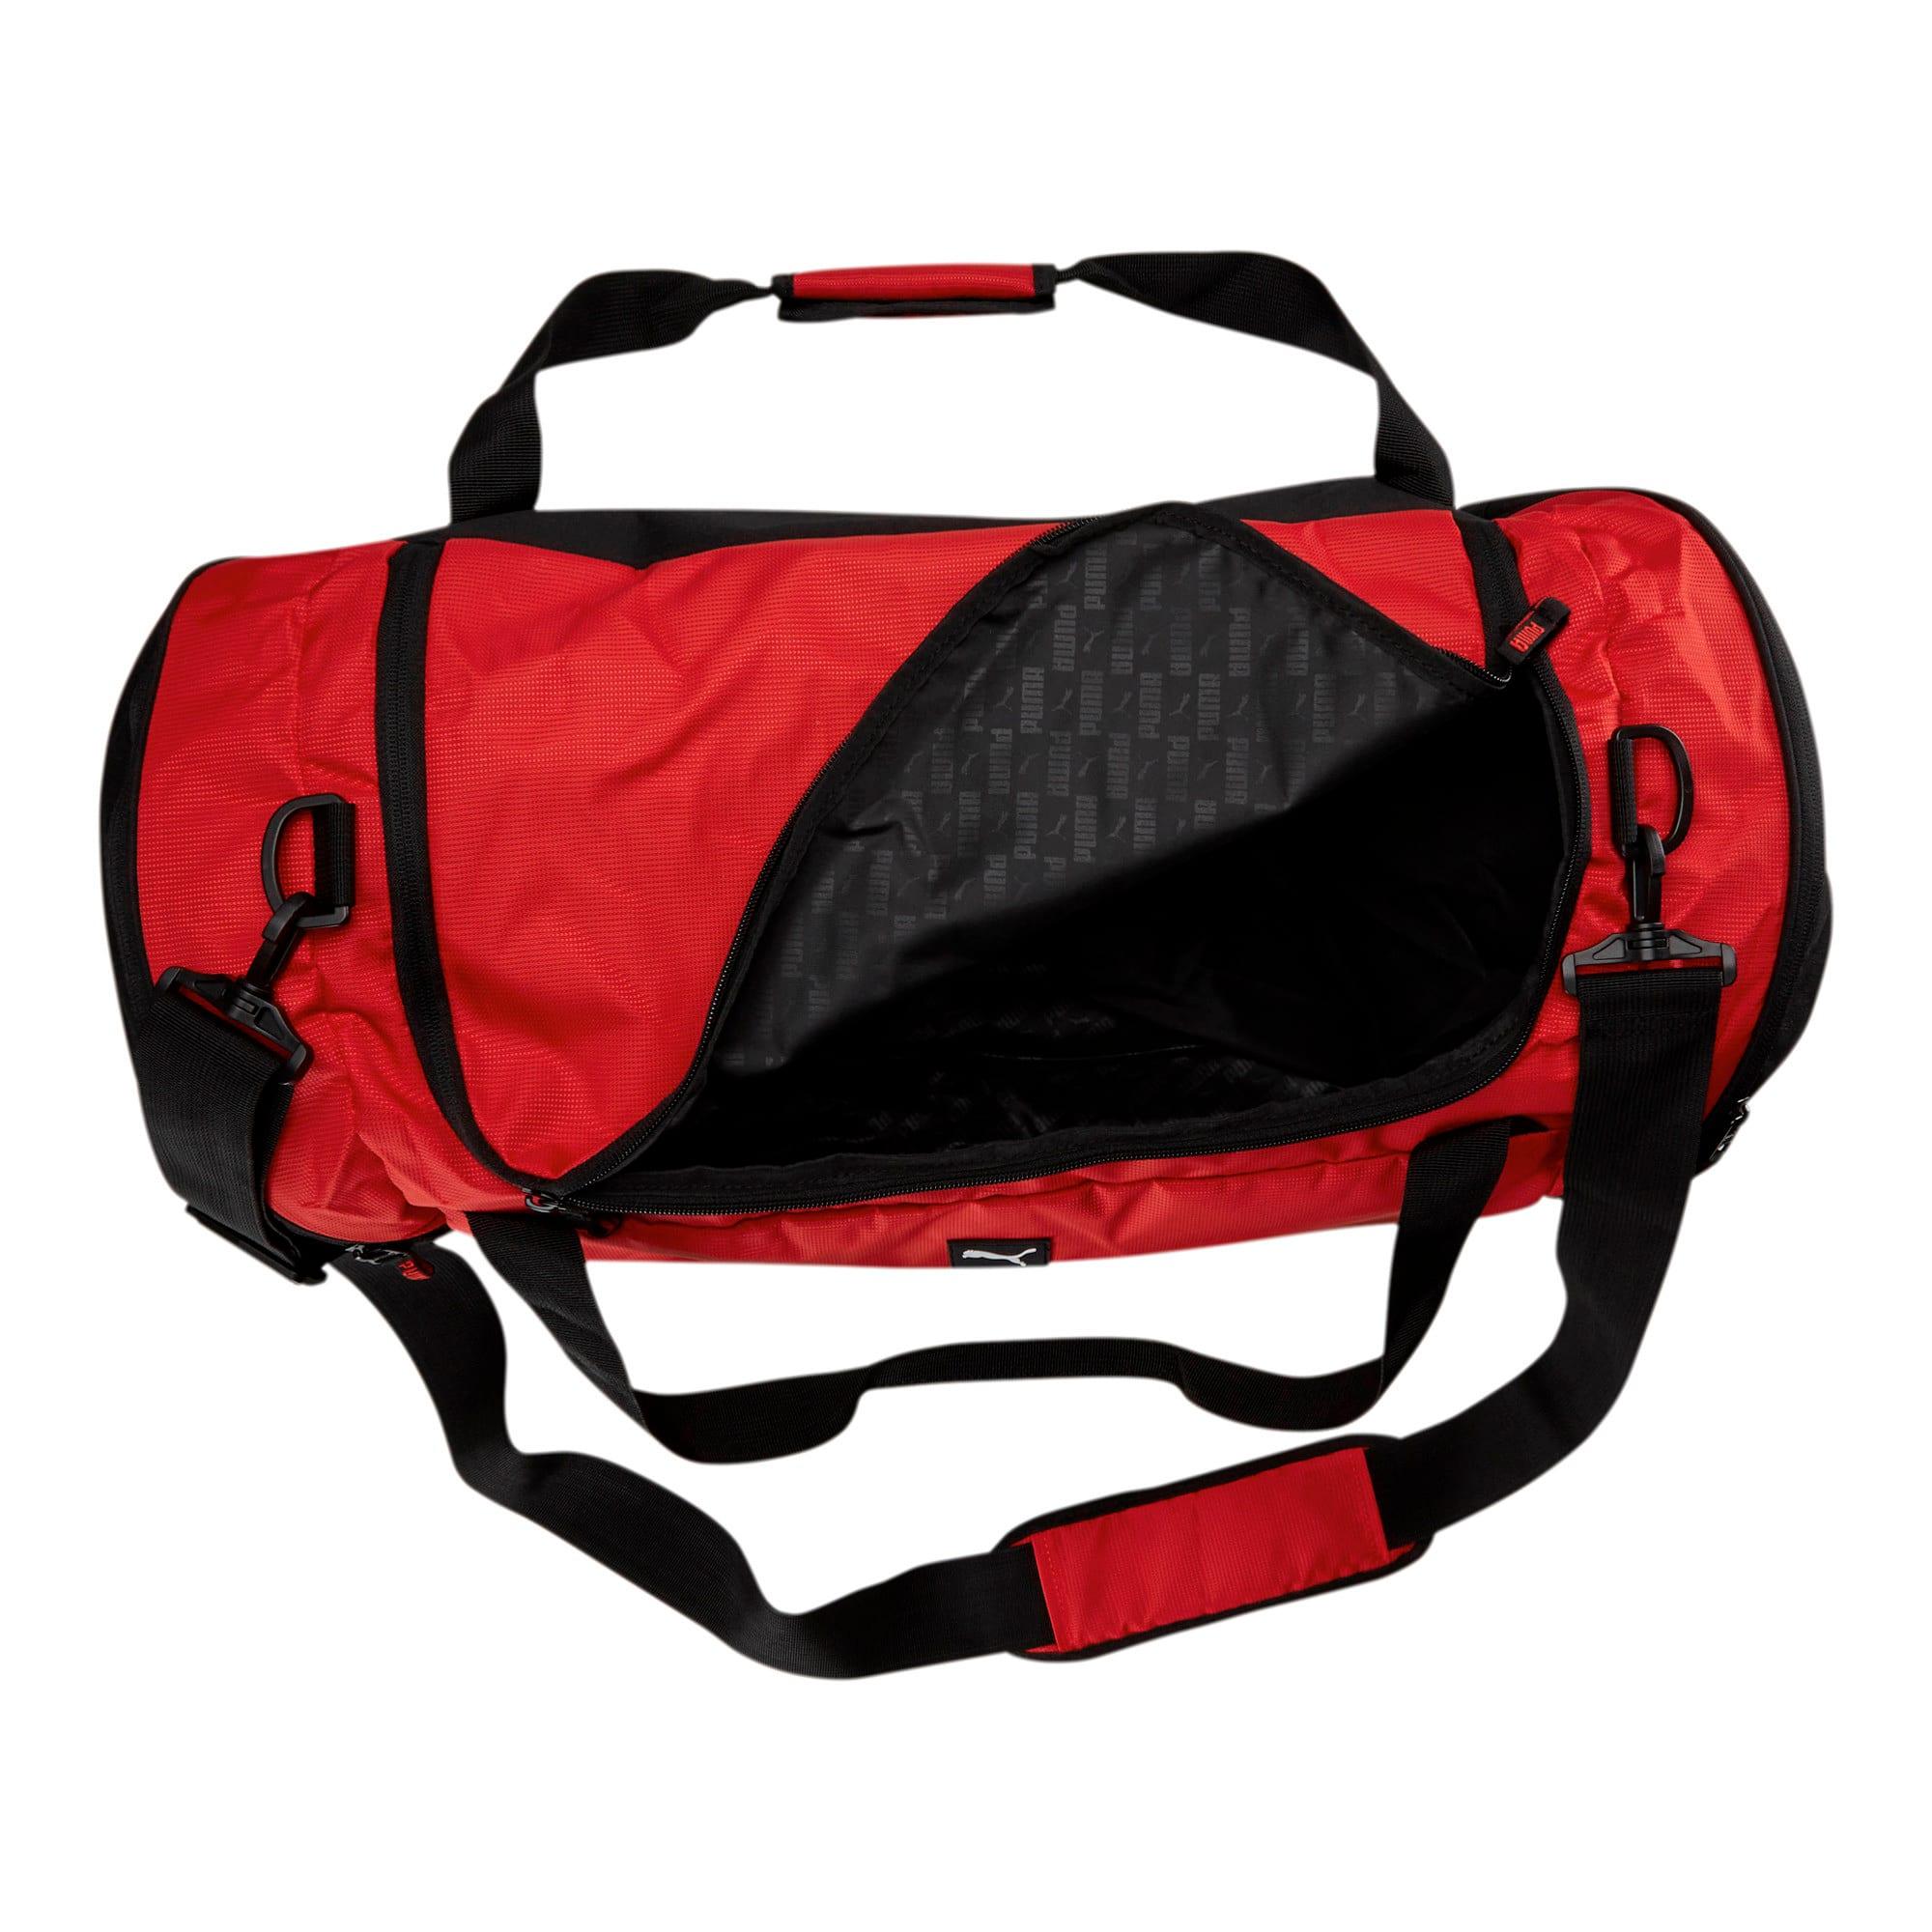 "Thumbnail 3 of Formation 2.0 24"" Duffel Bag, Medium Red, medium"